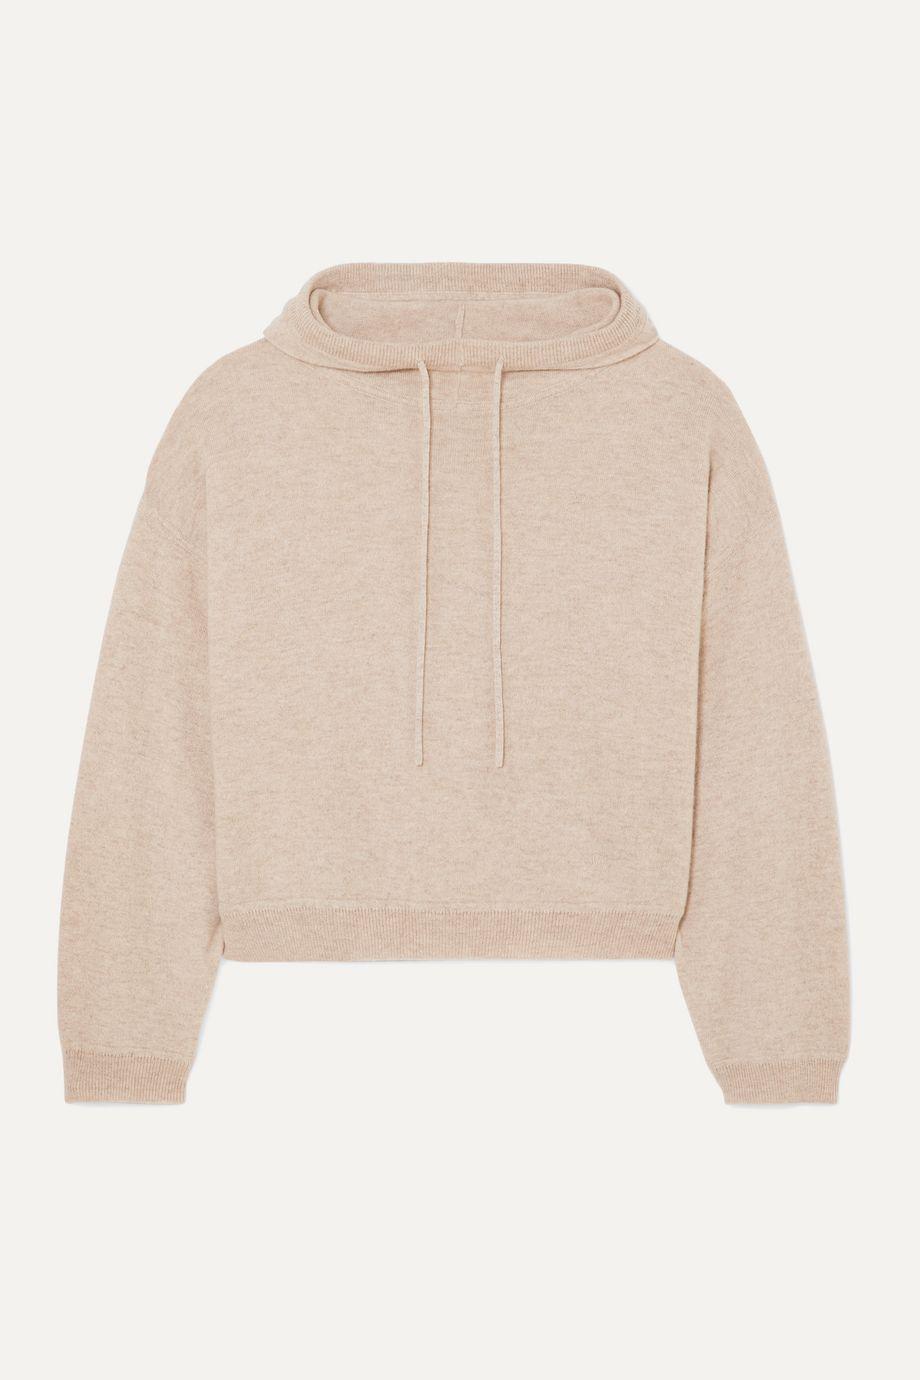 LOULOU STUDIO Salina cashmere hoodie